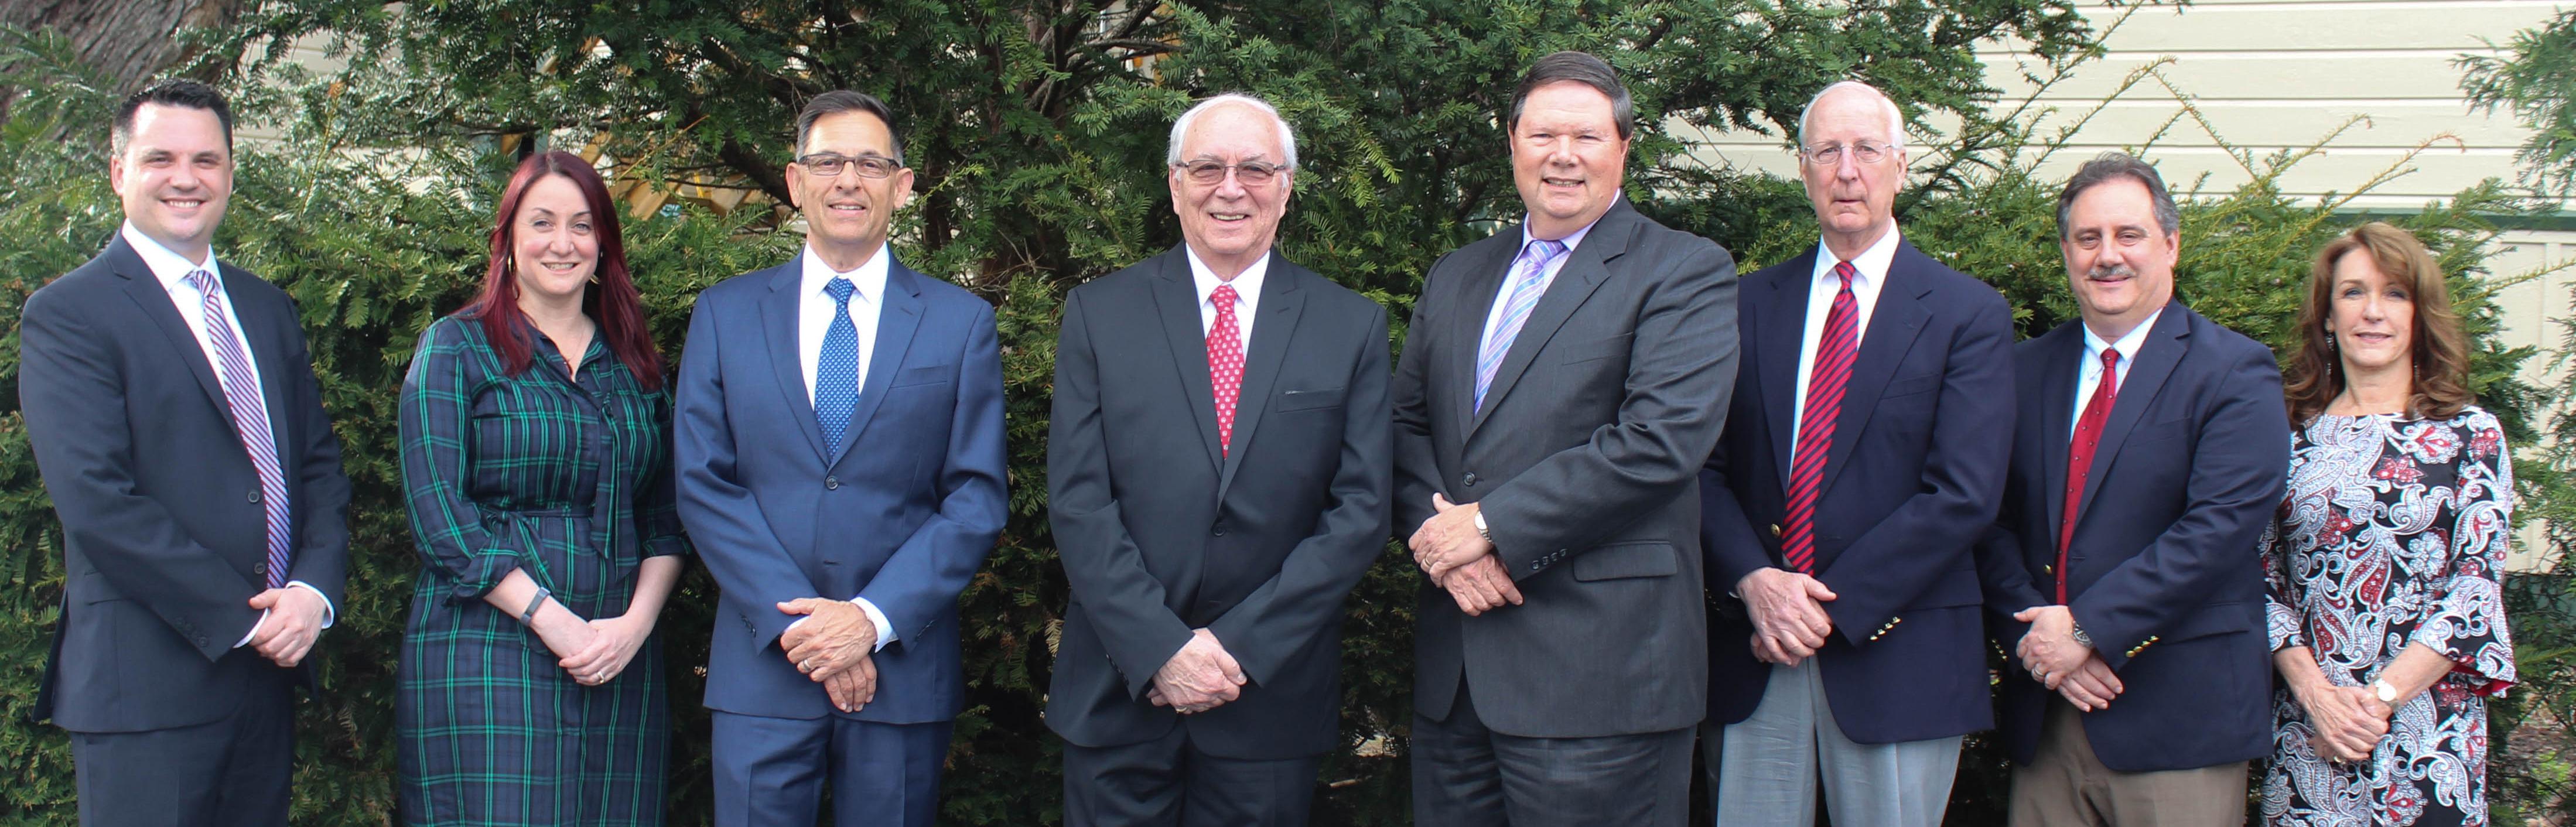 Board of Directors 4.2019